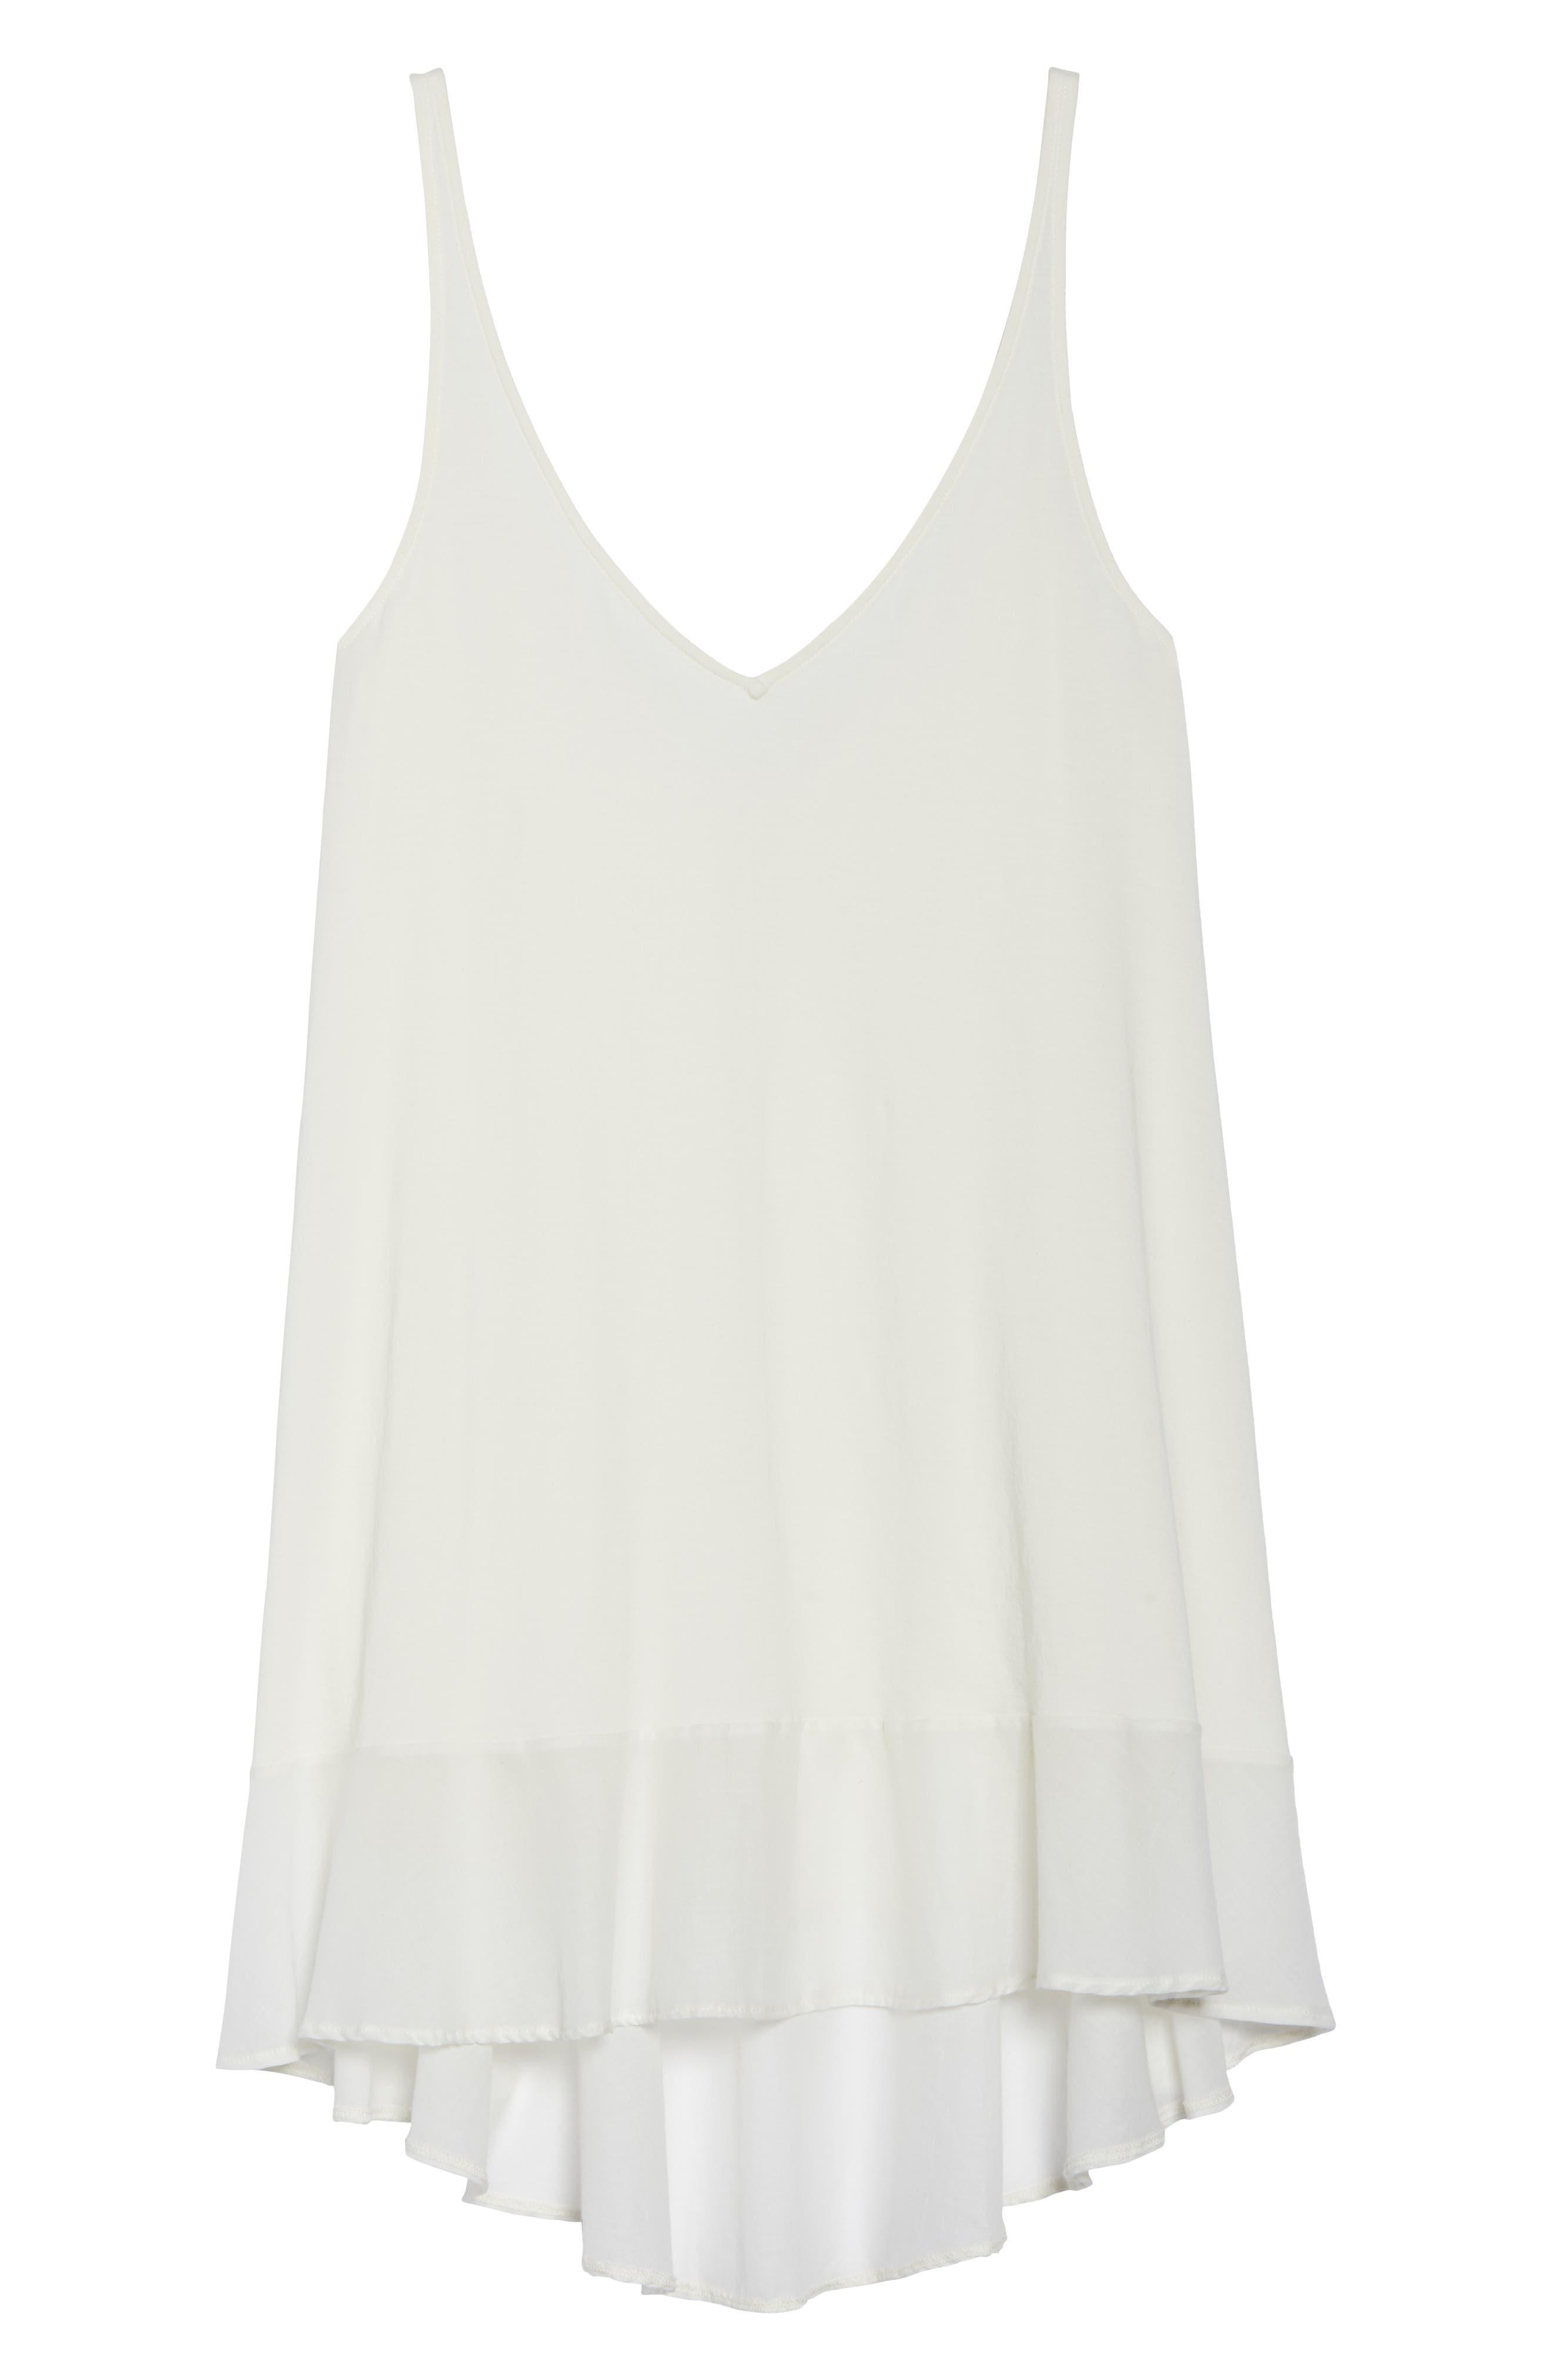 Bettina Pima Cotton Voile Nightgown,                             Alternate thumbnail 6, color,                             900